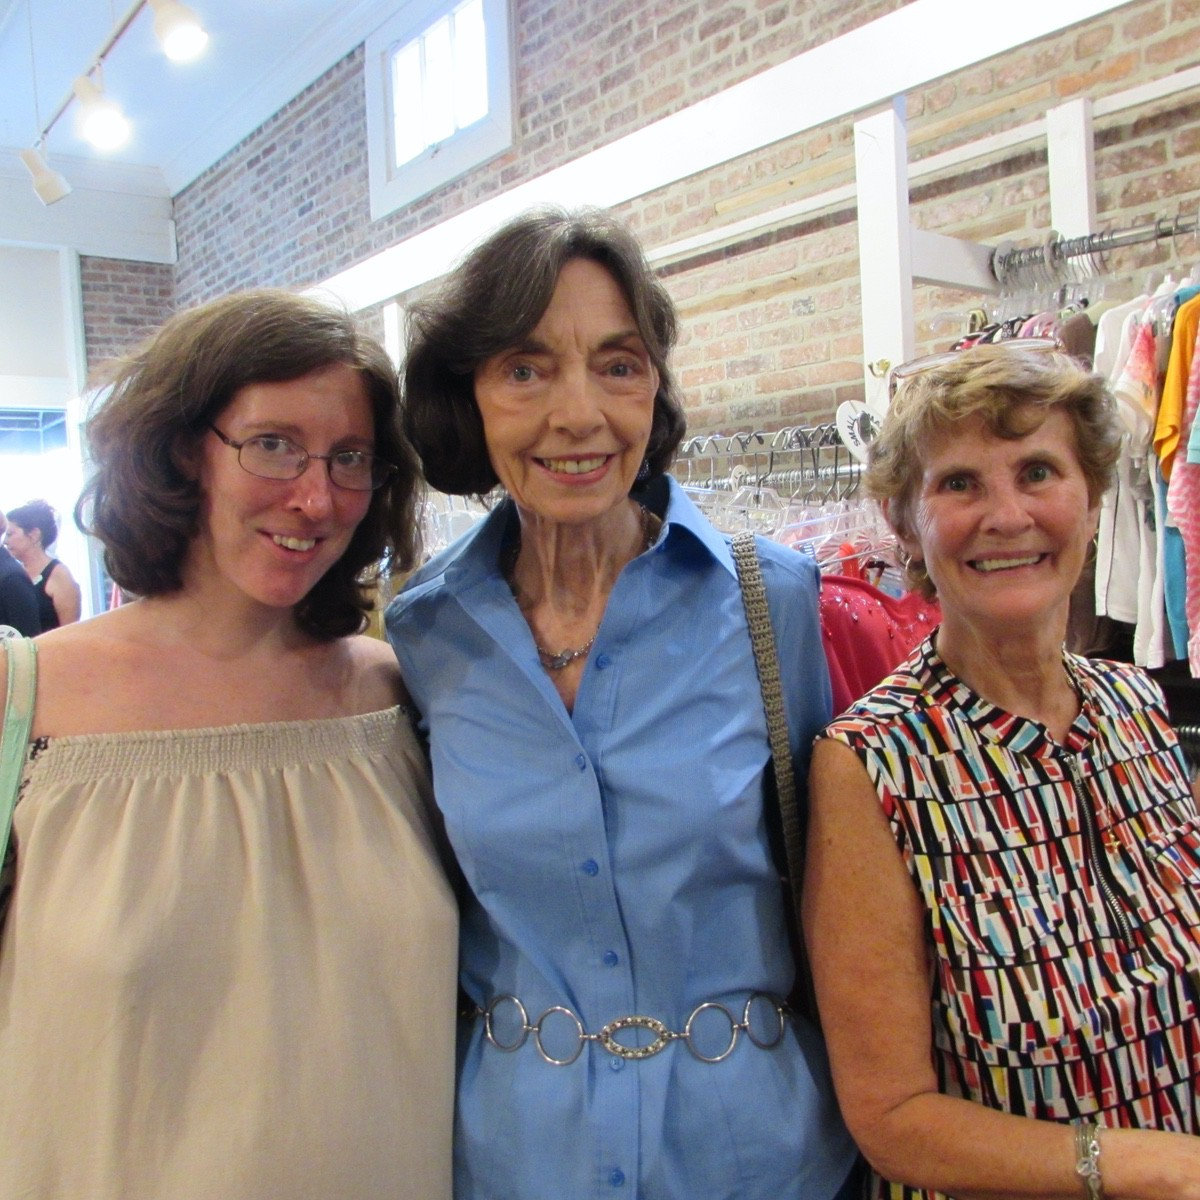 Taylor Bufkin, Jeanie Pickel and Catherine Hutchins